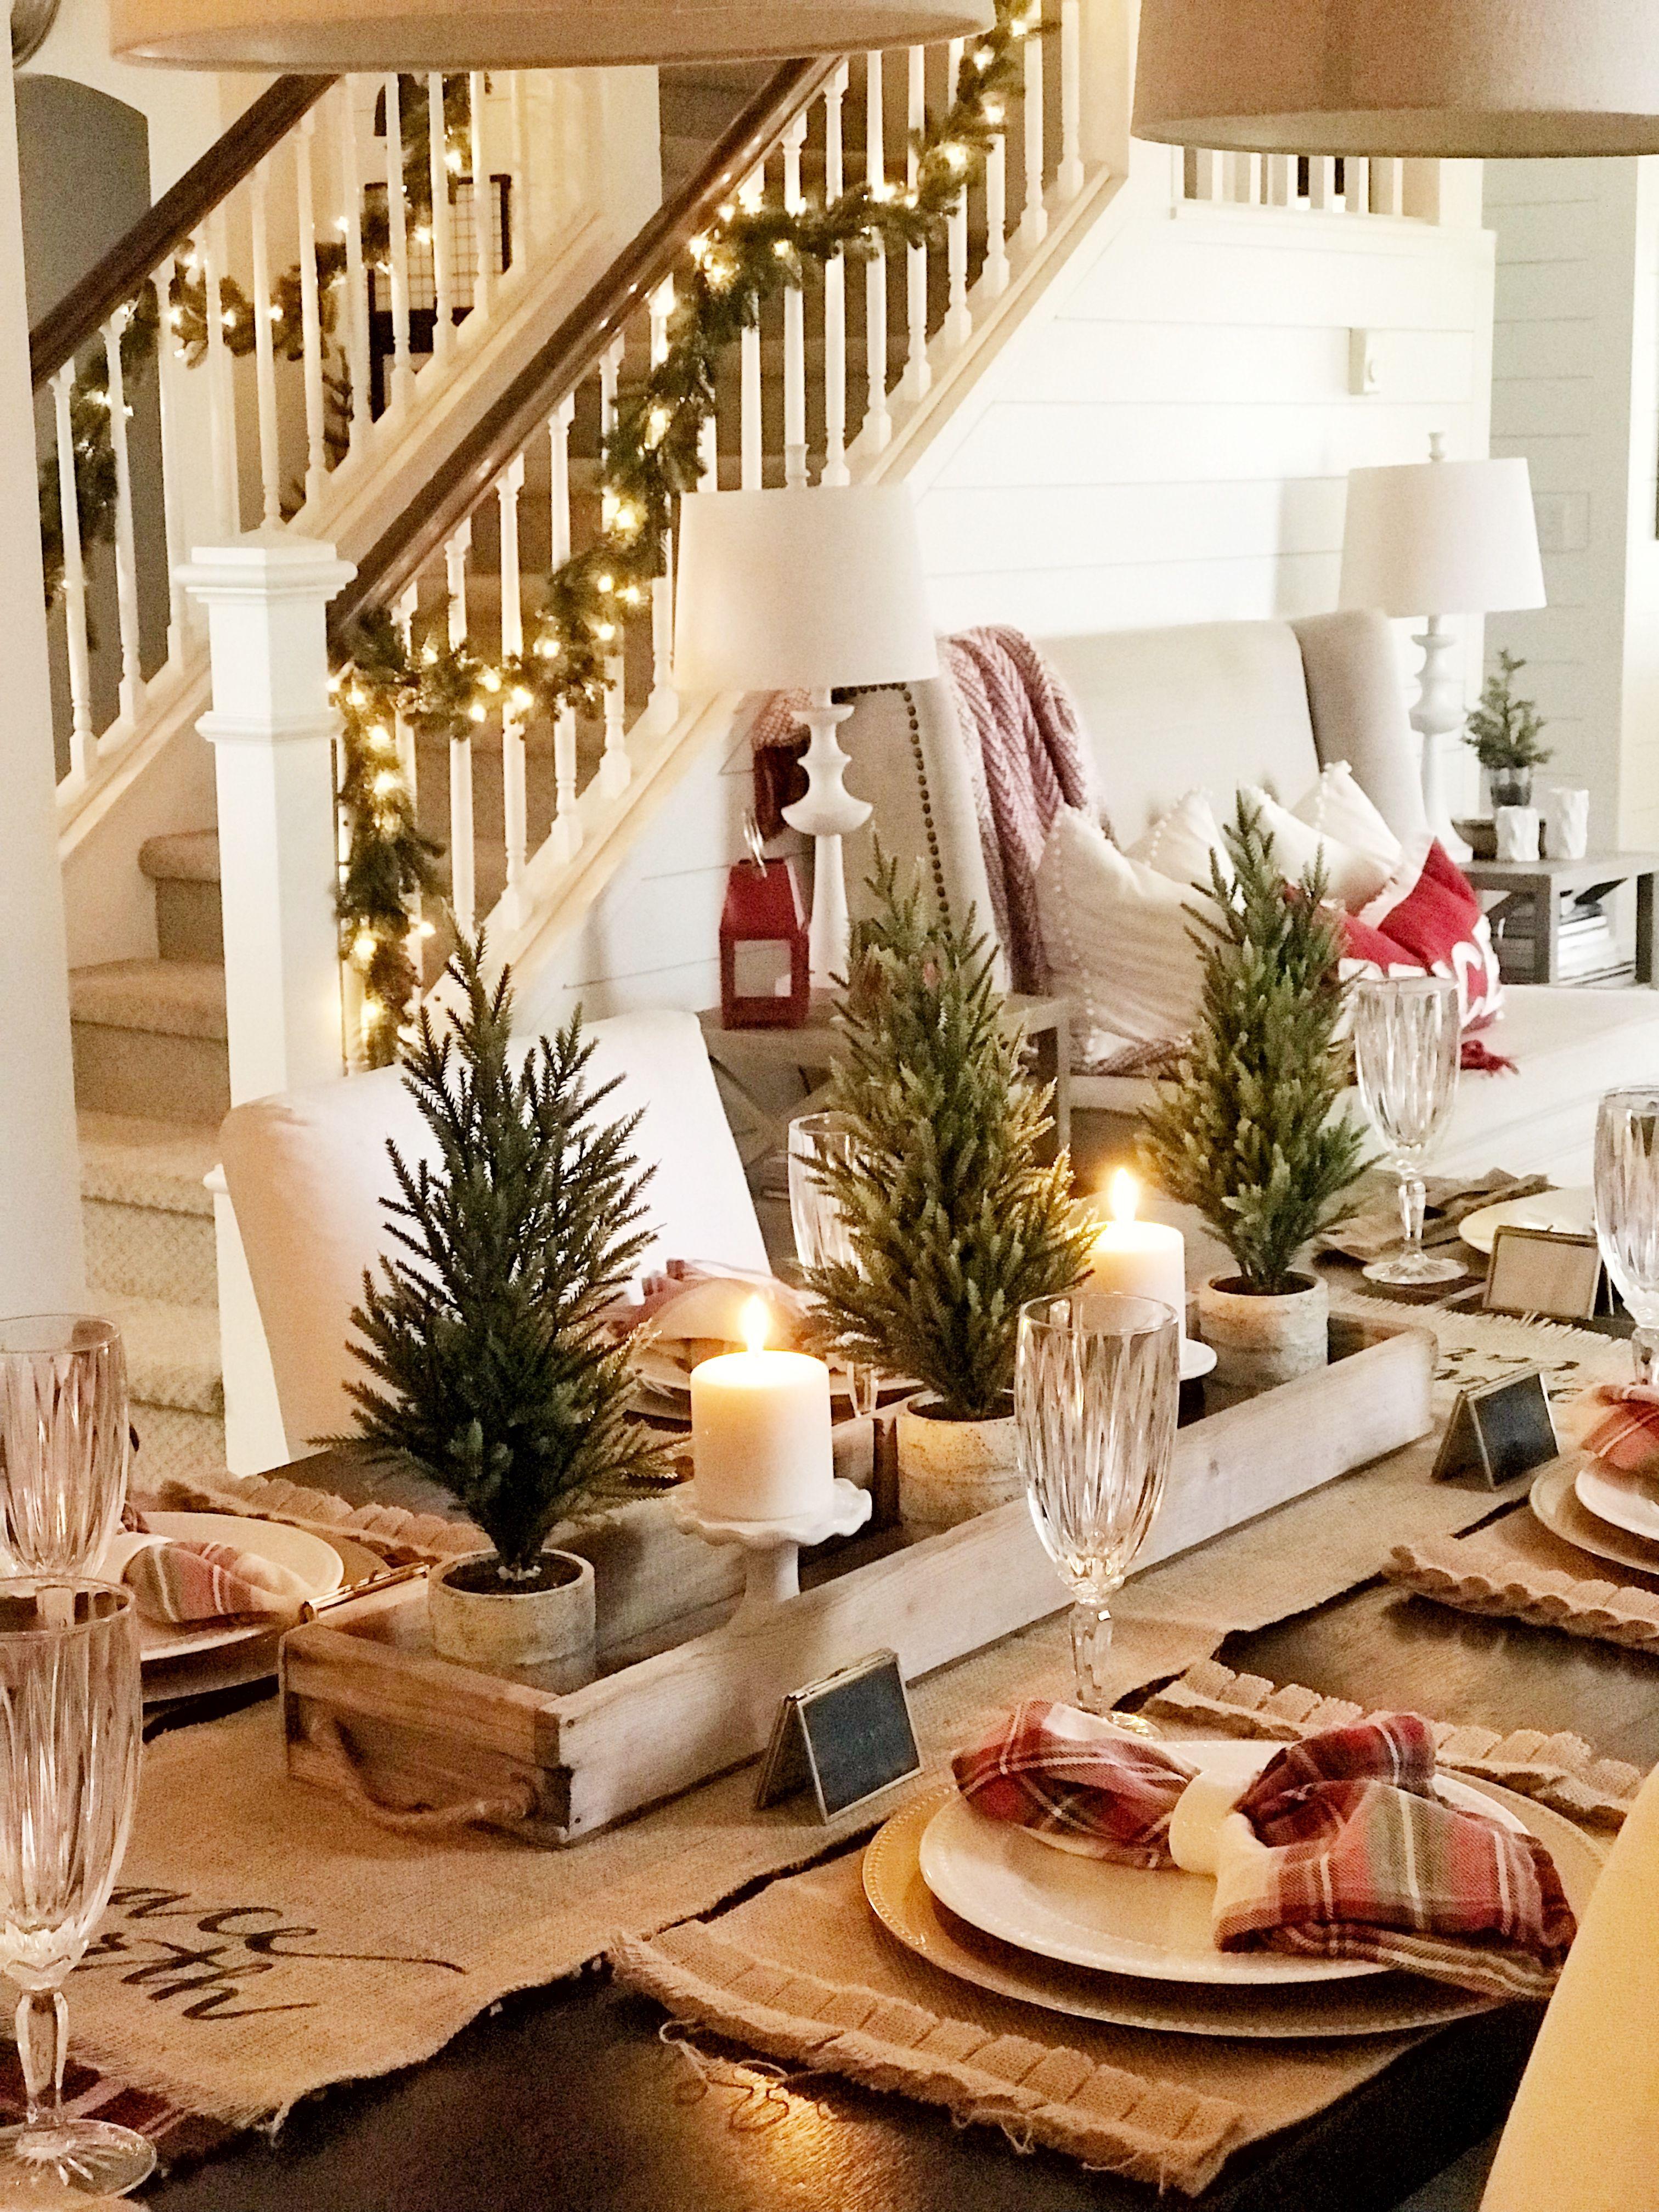 Christmas Decor Ideas for Your Dining Room Decor Simple